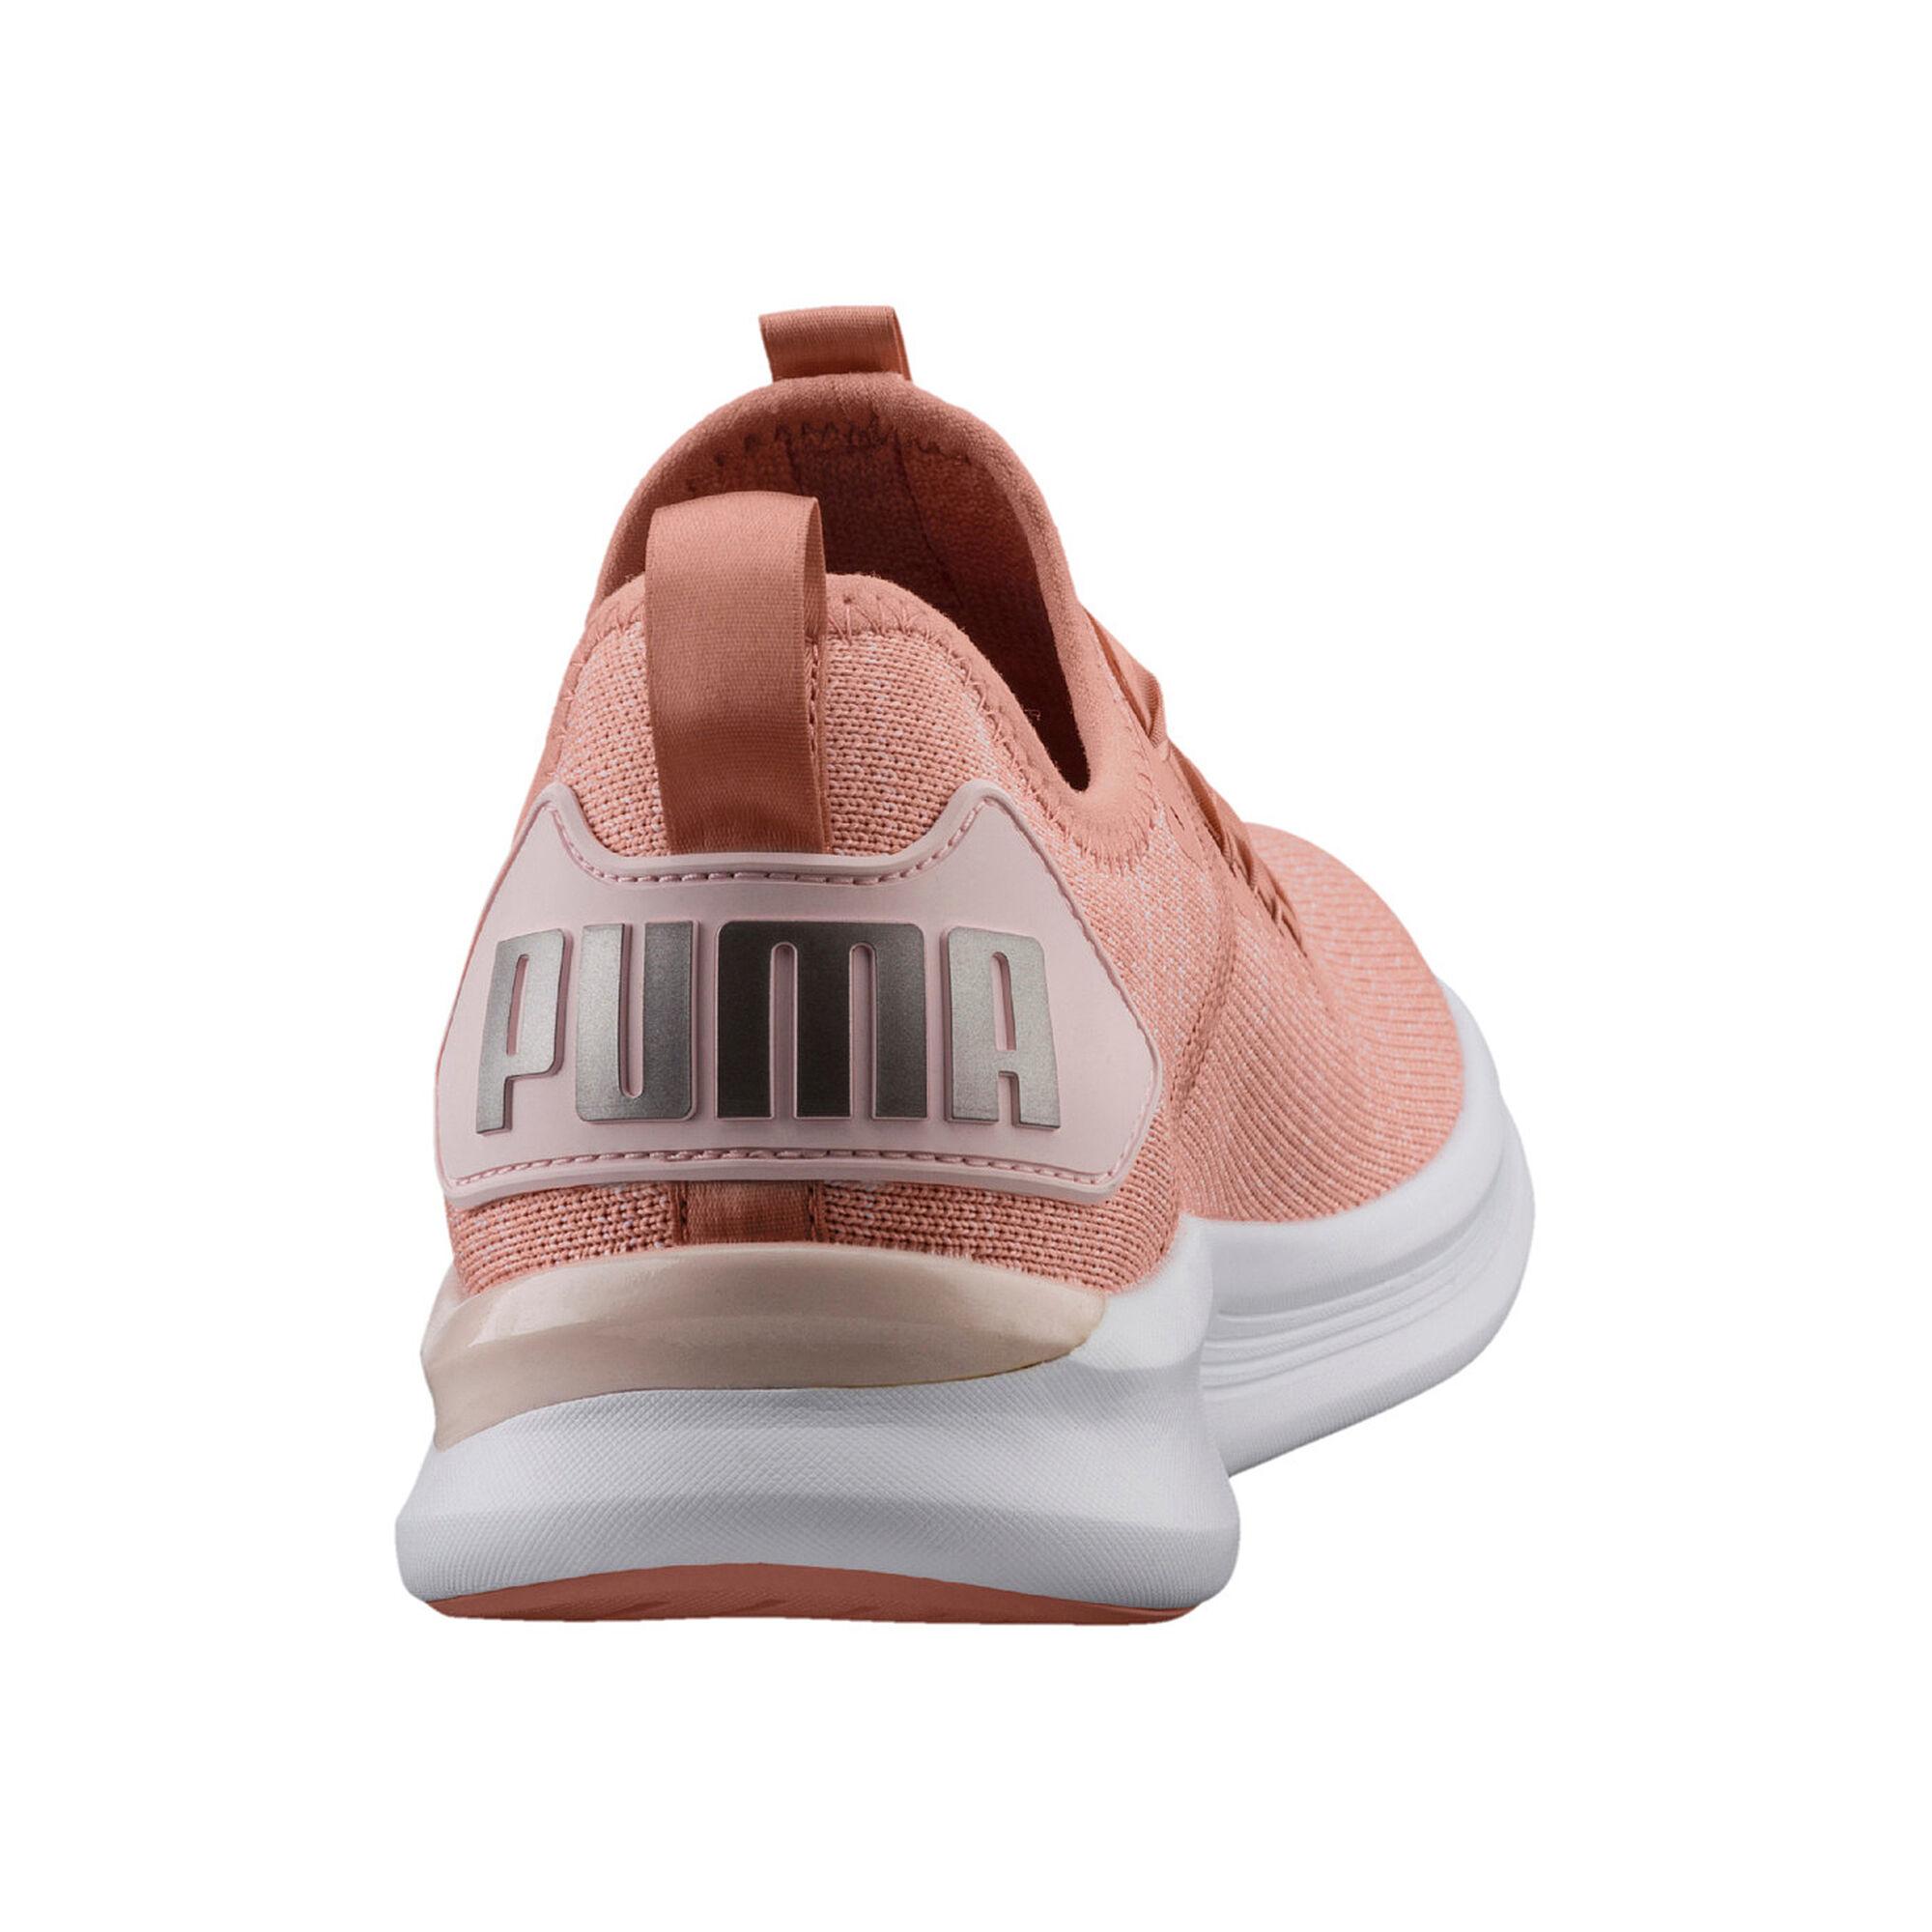 wholesale dealer dde41 c7d65 buy Puma Ignite Flash EvoKNIT Satin EP Fitness Shoe Women ...